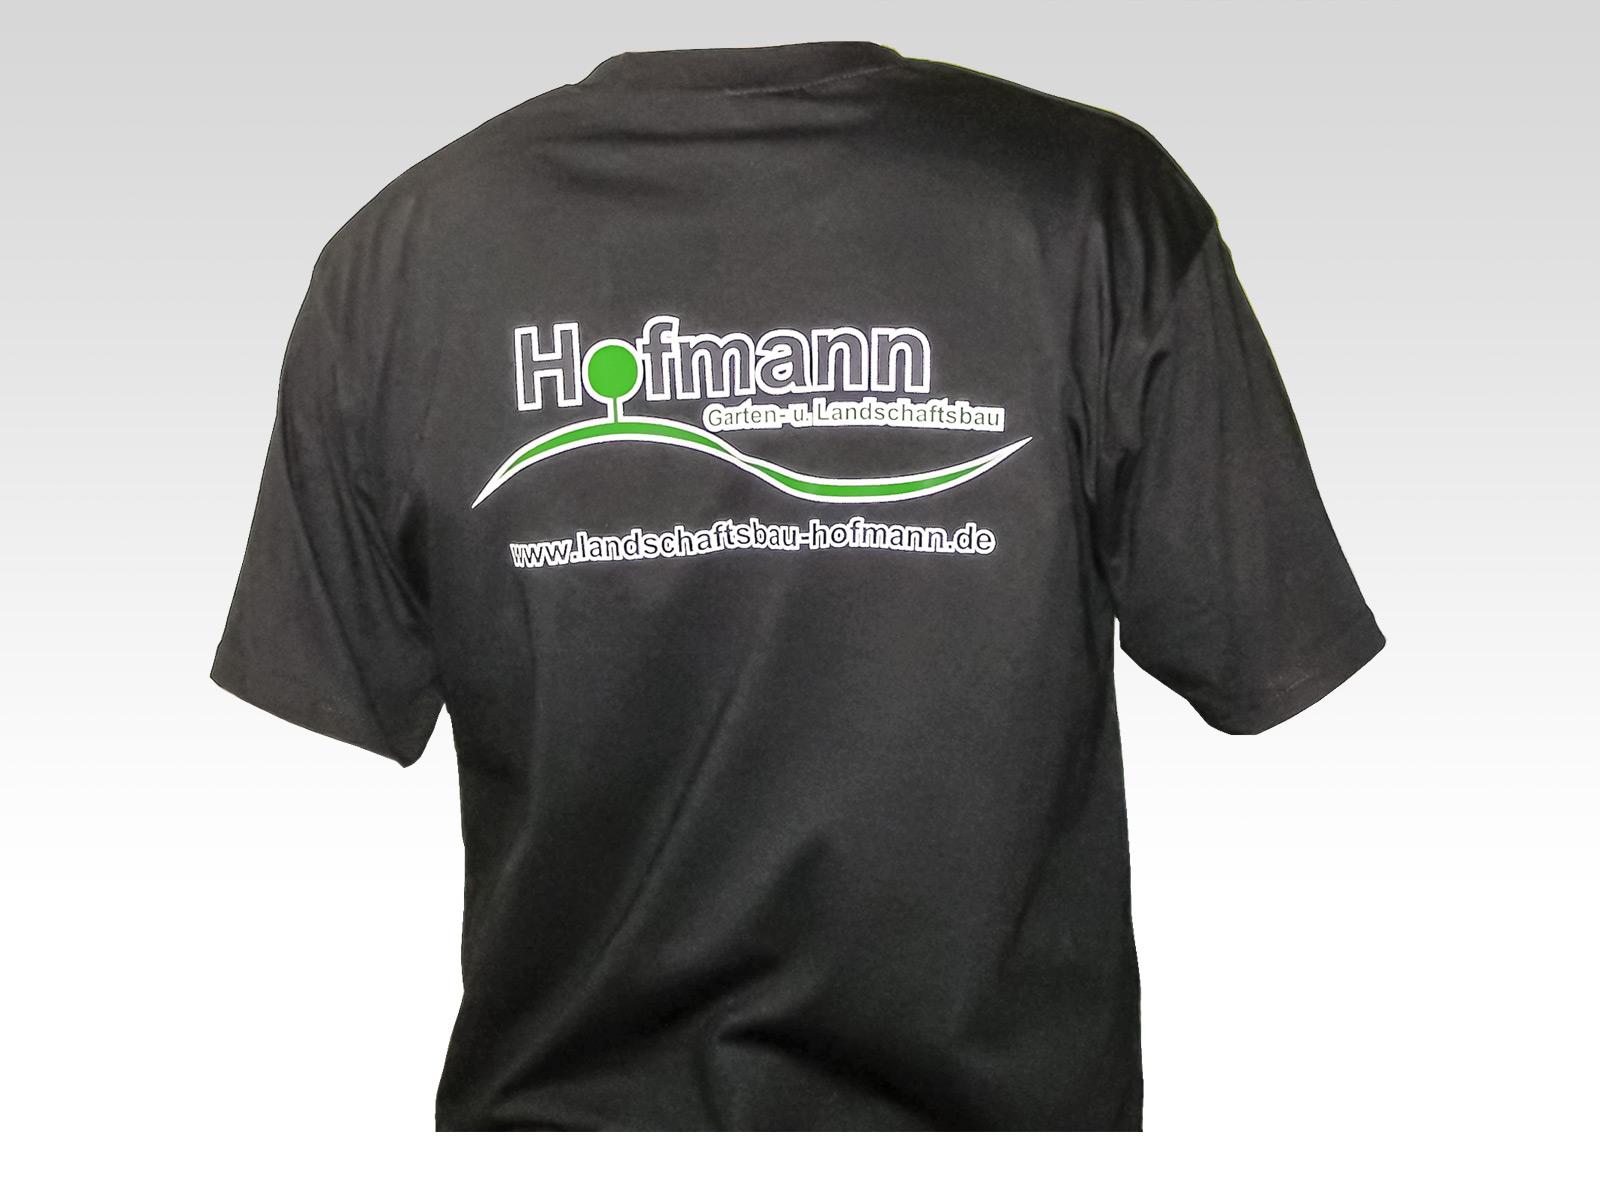 Werbeagentur Focus Nürnberg Hofmann Gartenbau T-shirt